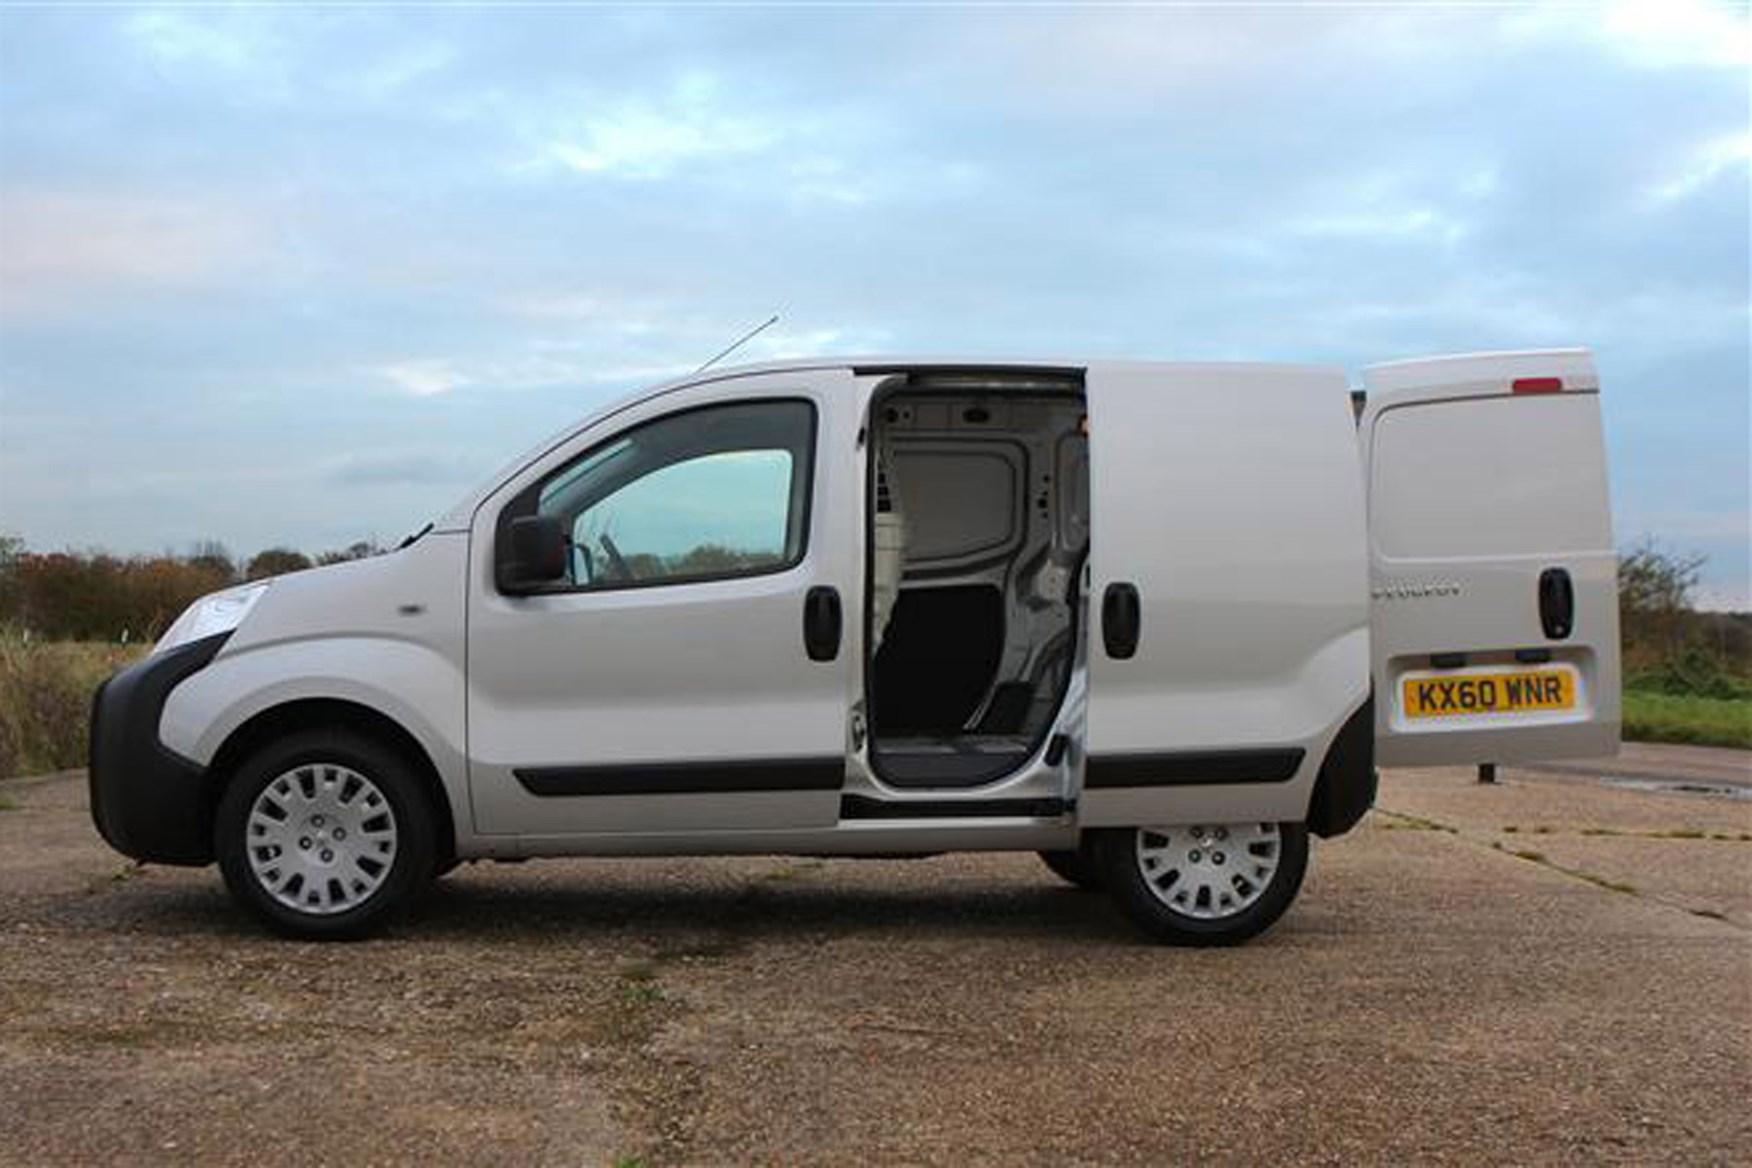 Peugeot Bipper review on Parkers Vans - load area access